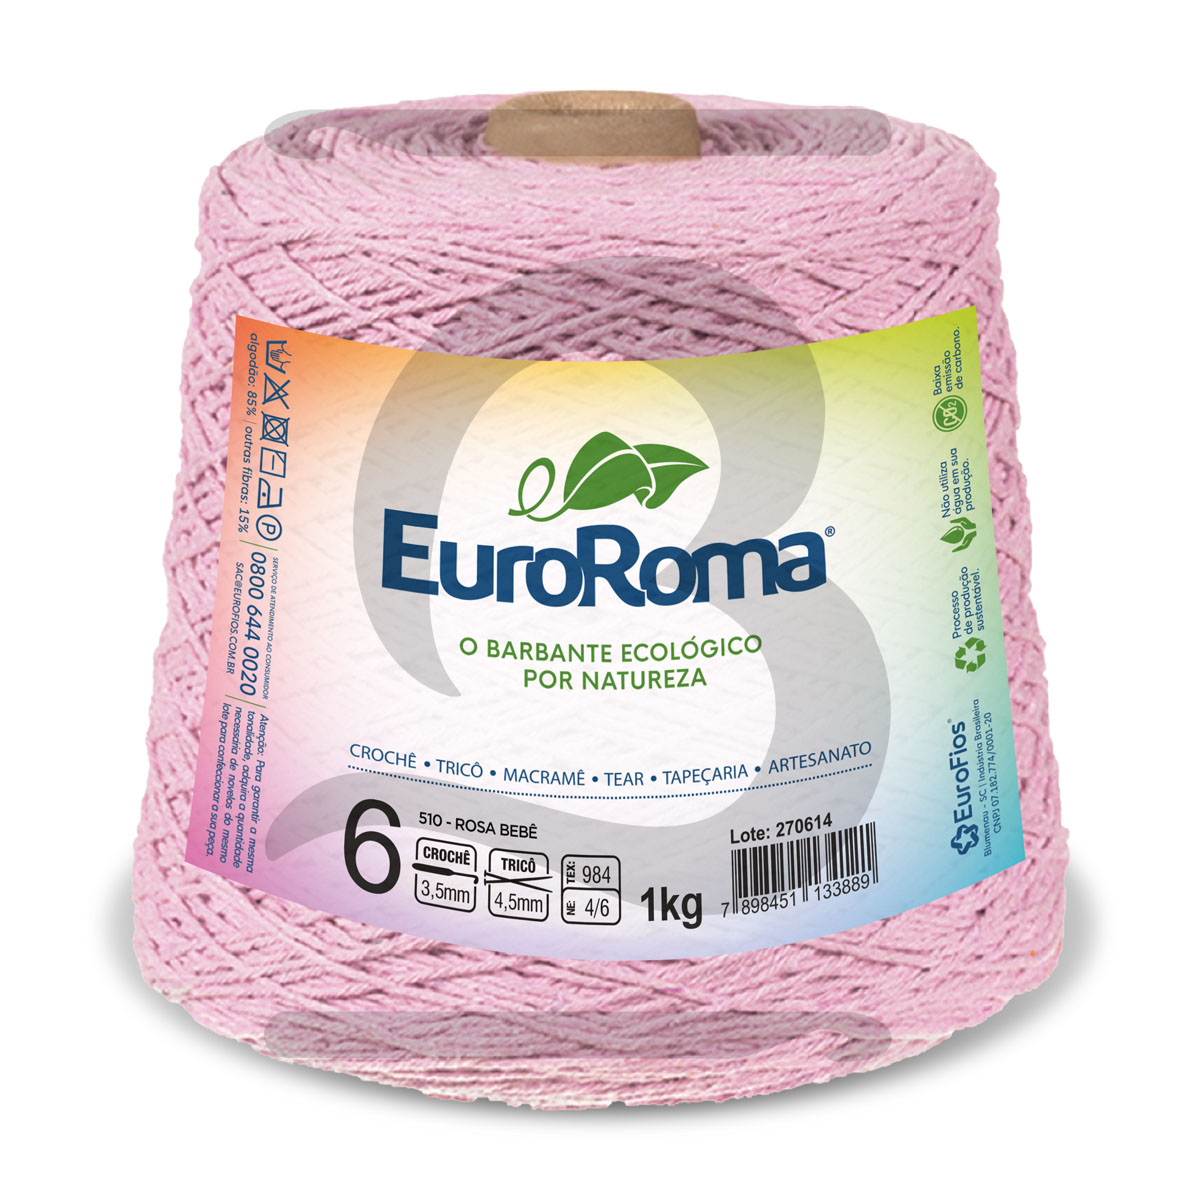 Barbante EuroRoma Colorido N°6 - 1kg Cor 510 Rosa Bebê